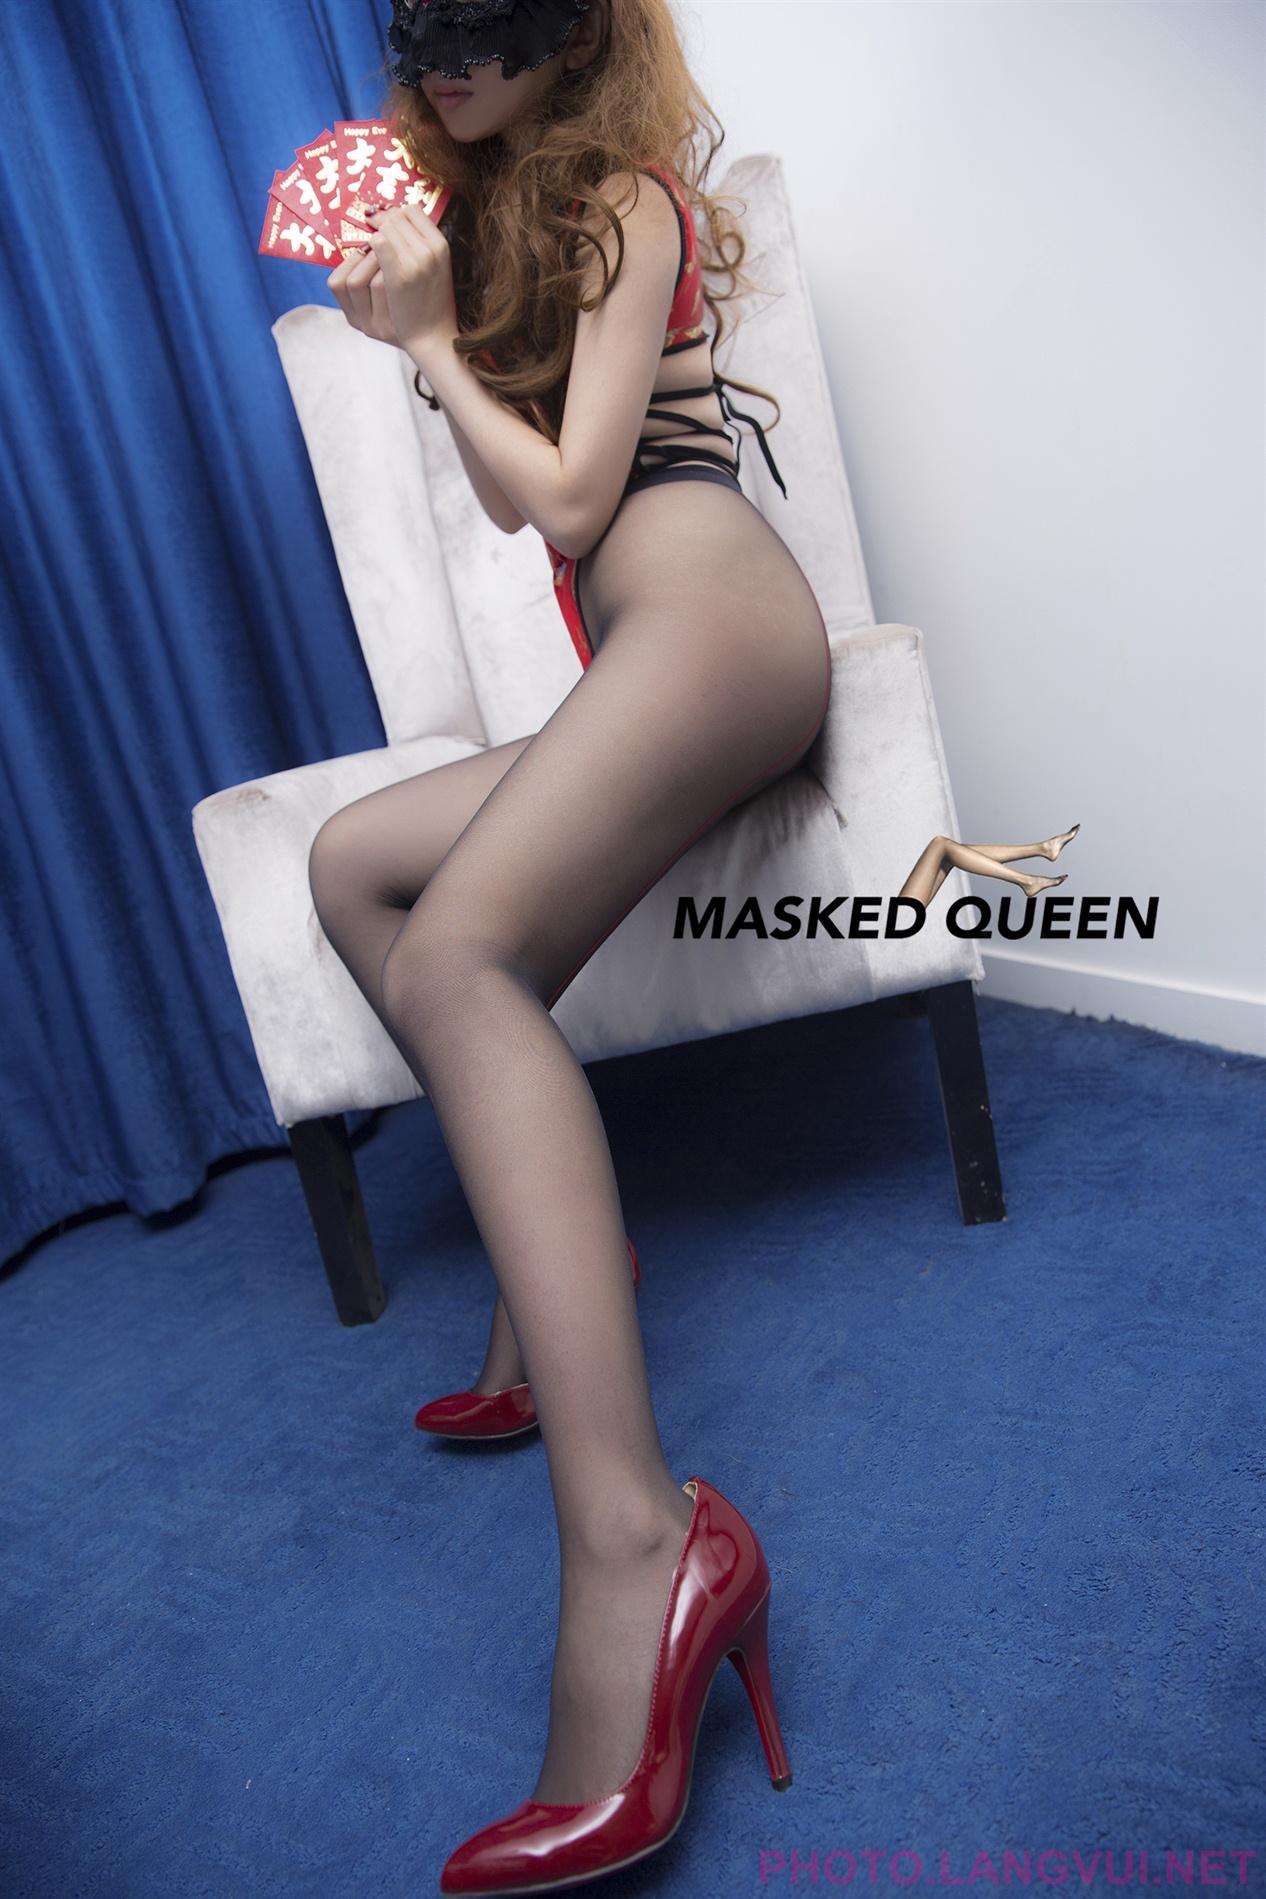 MASKED QUEEN No 006